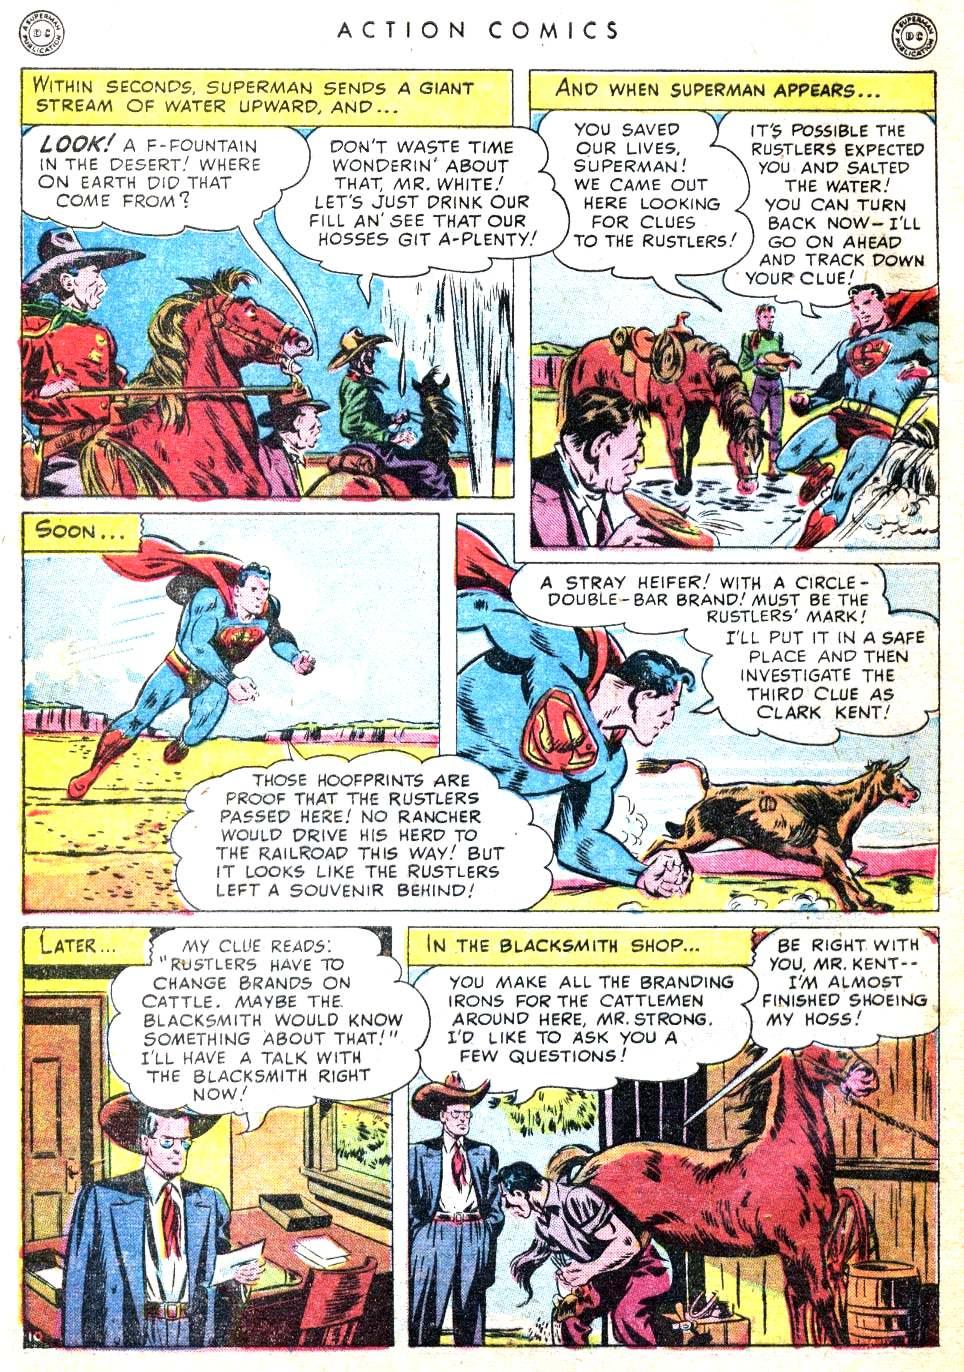 Action Comics (1938) 134 Page 11